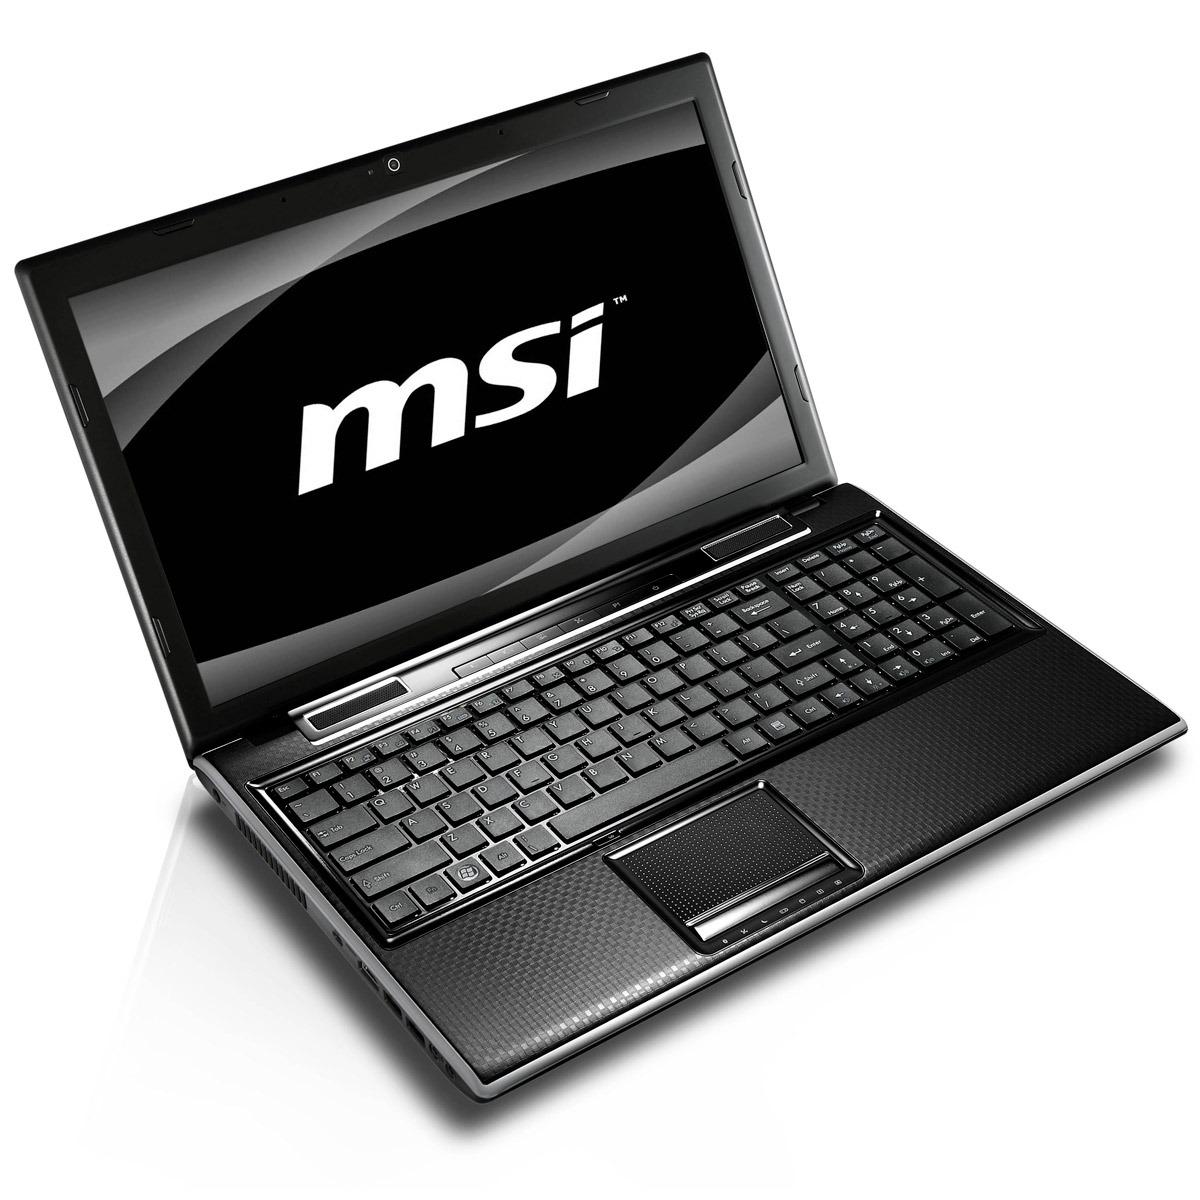 "PC portable MSI FX600-030 MSI FX600-030 - Intel Core i3-350M 4 Go 320 Go 15.6"" LCD NVIDIA GeForce GT 325M Graveur DVD Wi-Fi N/Bluetooth Webcam Windows 7 Premium 64 bits (garantie constructeur 2 ans)"